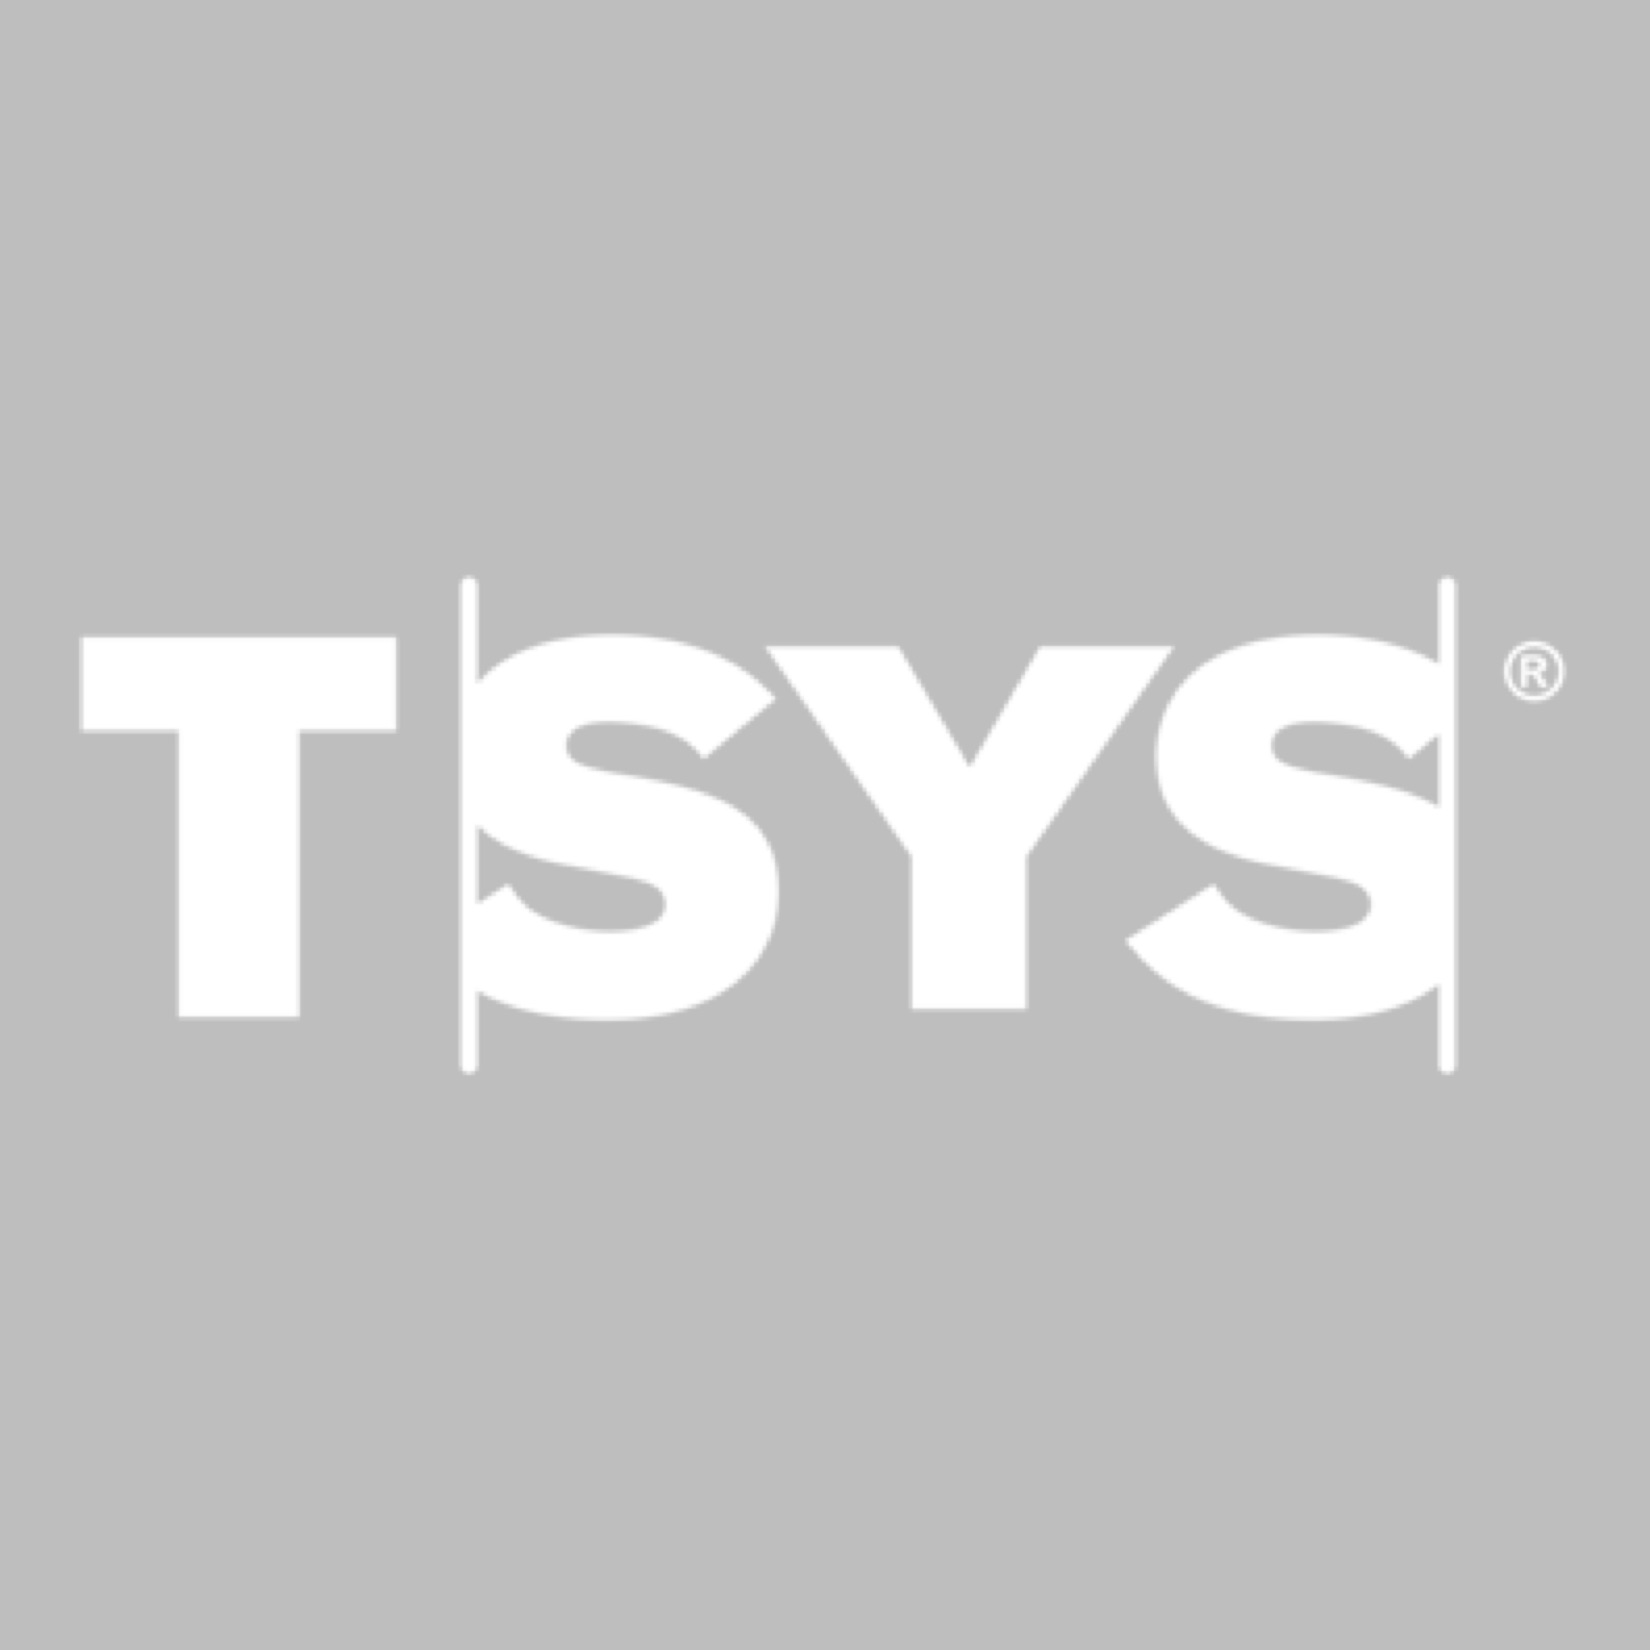 APG-TSYS.jpg